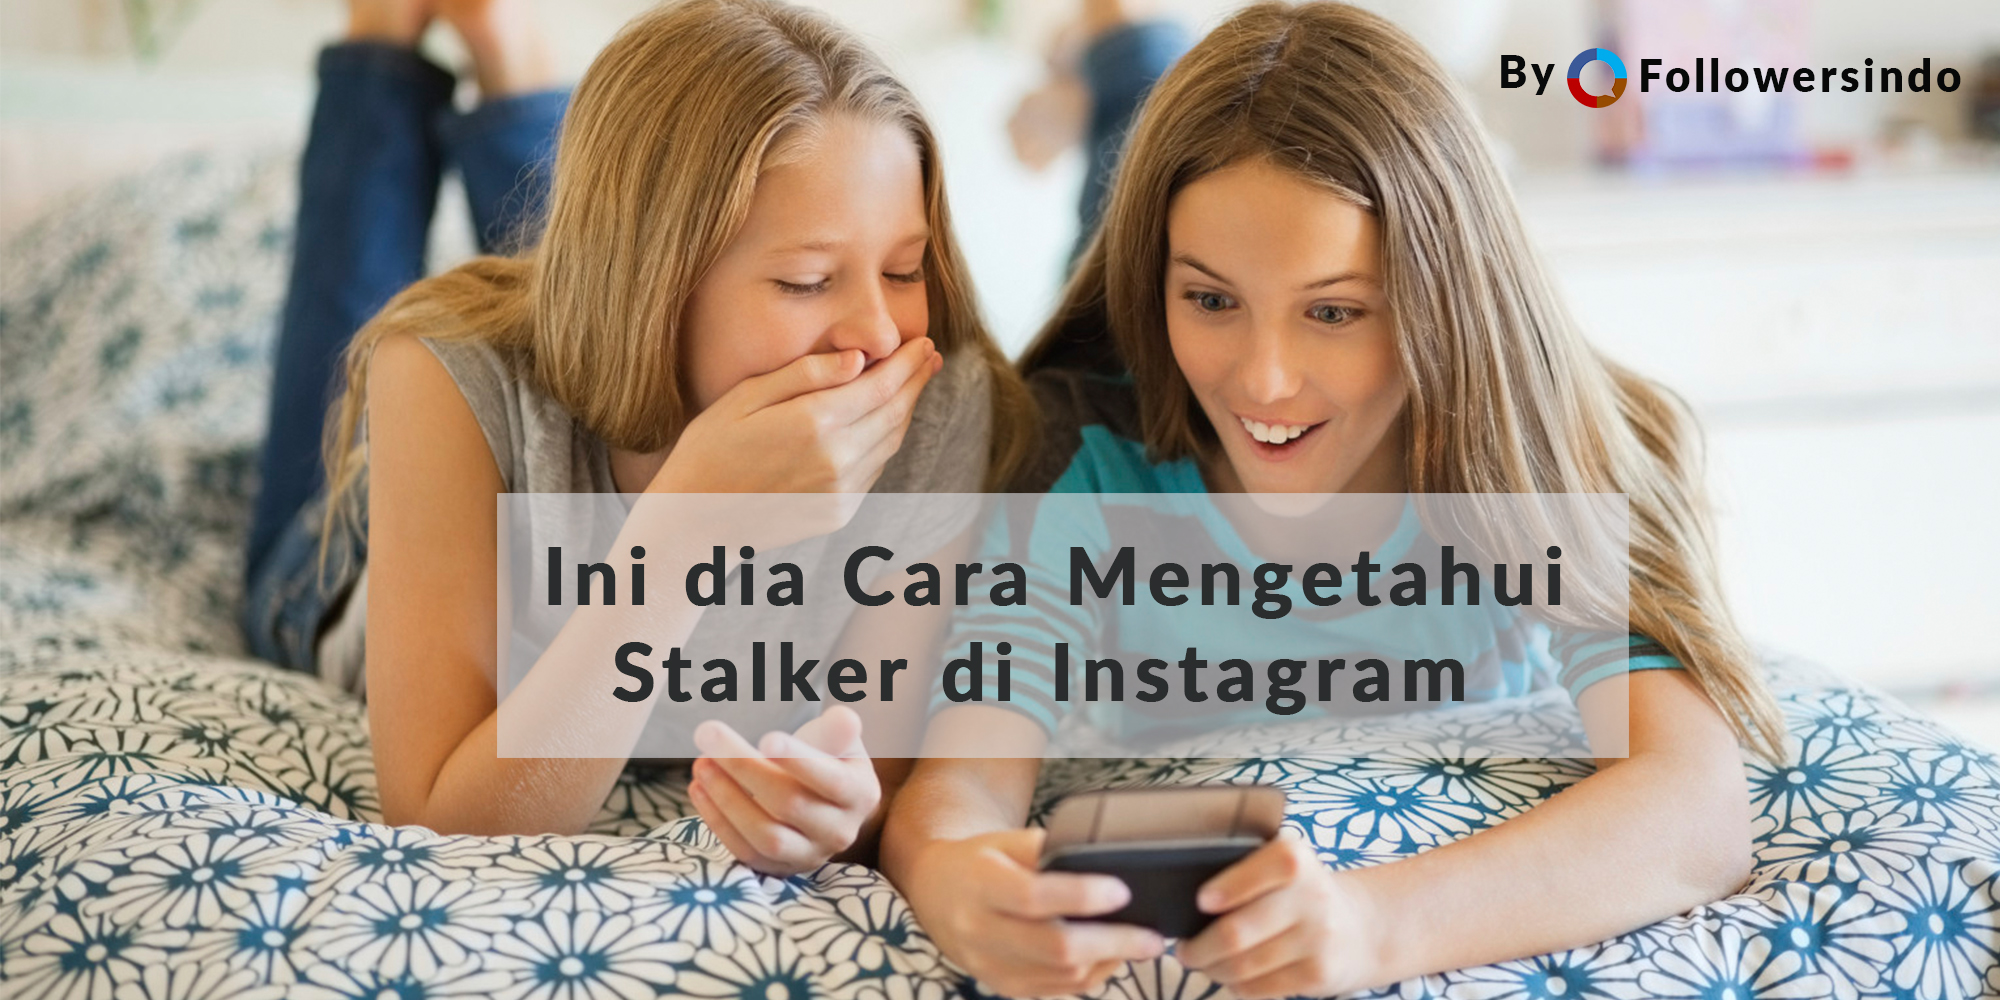 Cara Melihat Stalker di Instagram dengan Aplikasi Update 2018 - Followersindo.com